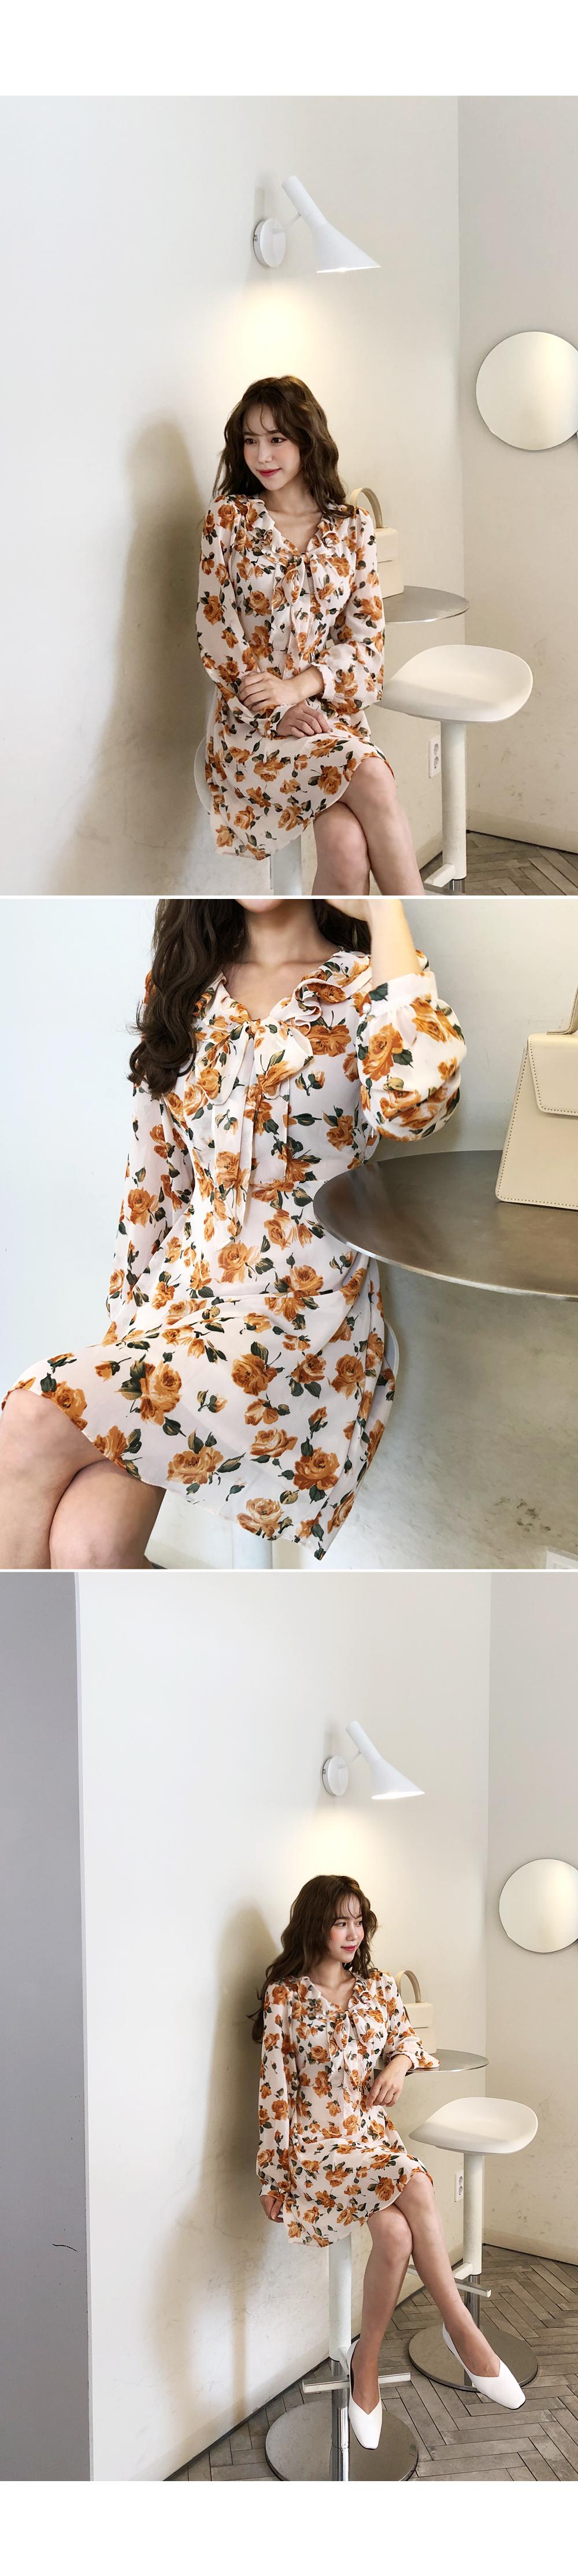 Bright secret dress